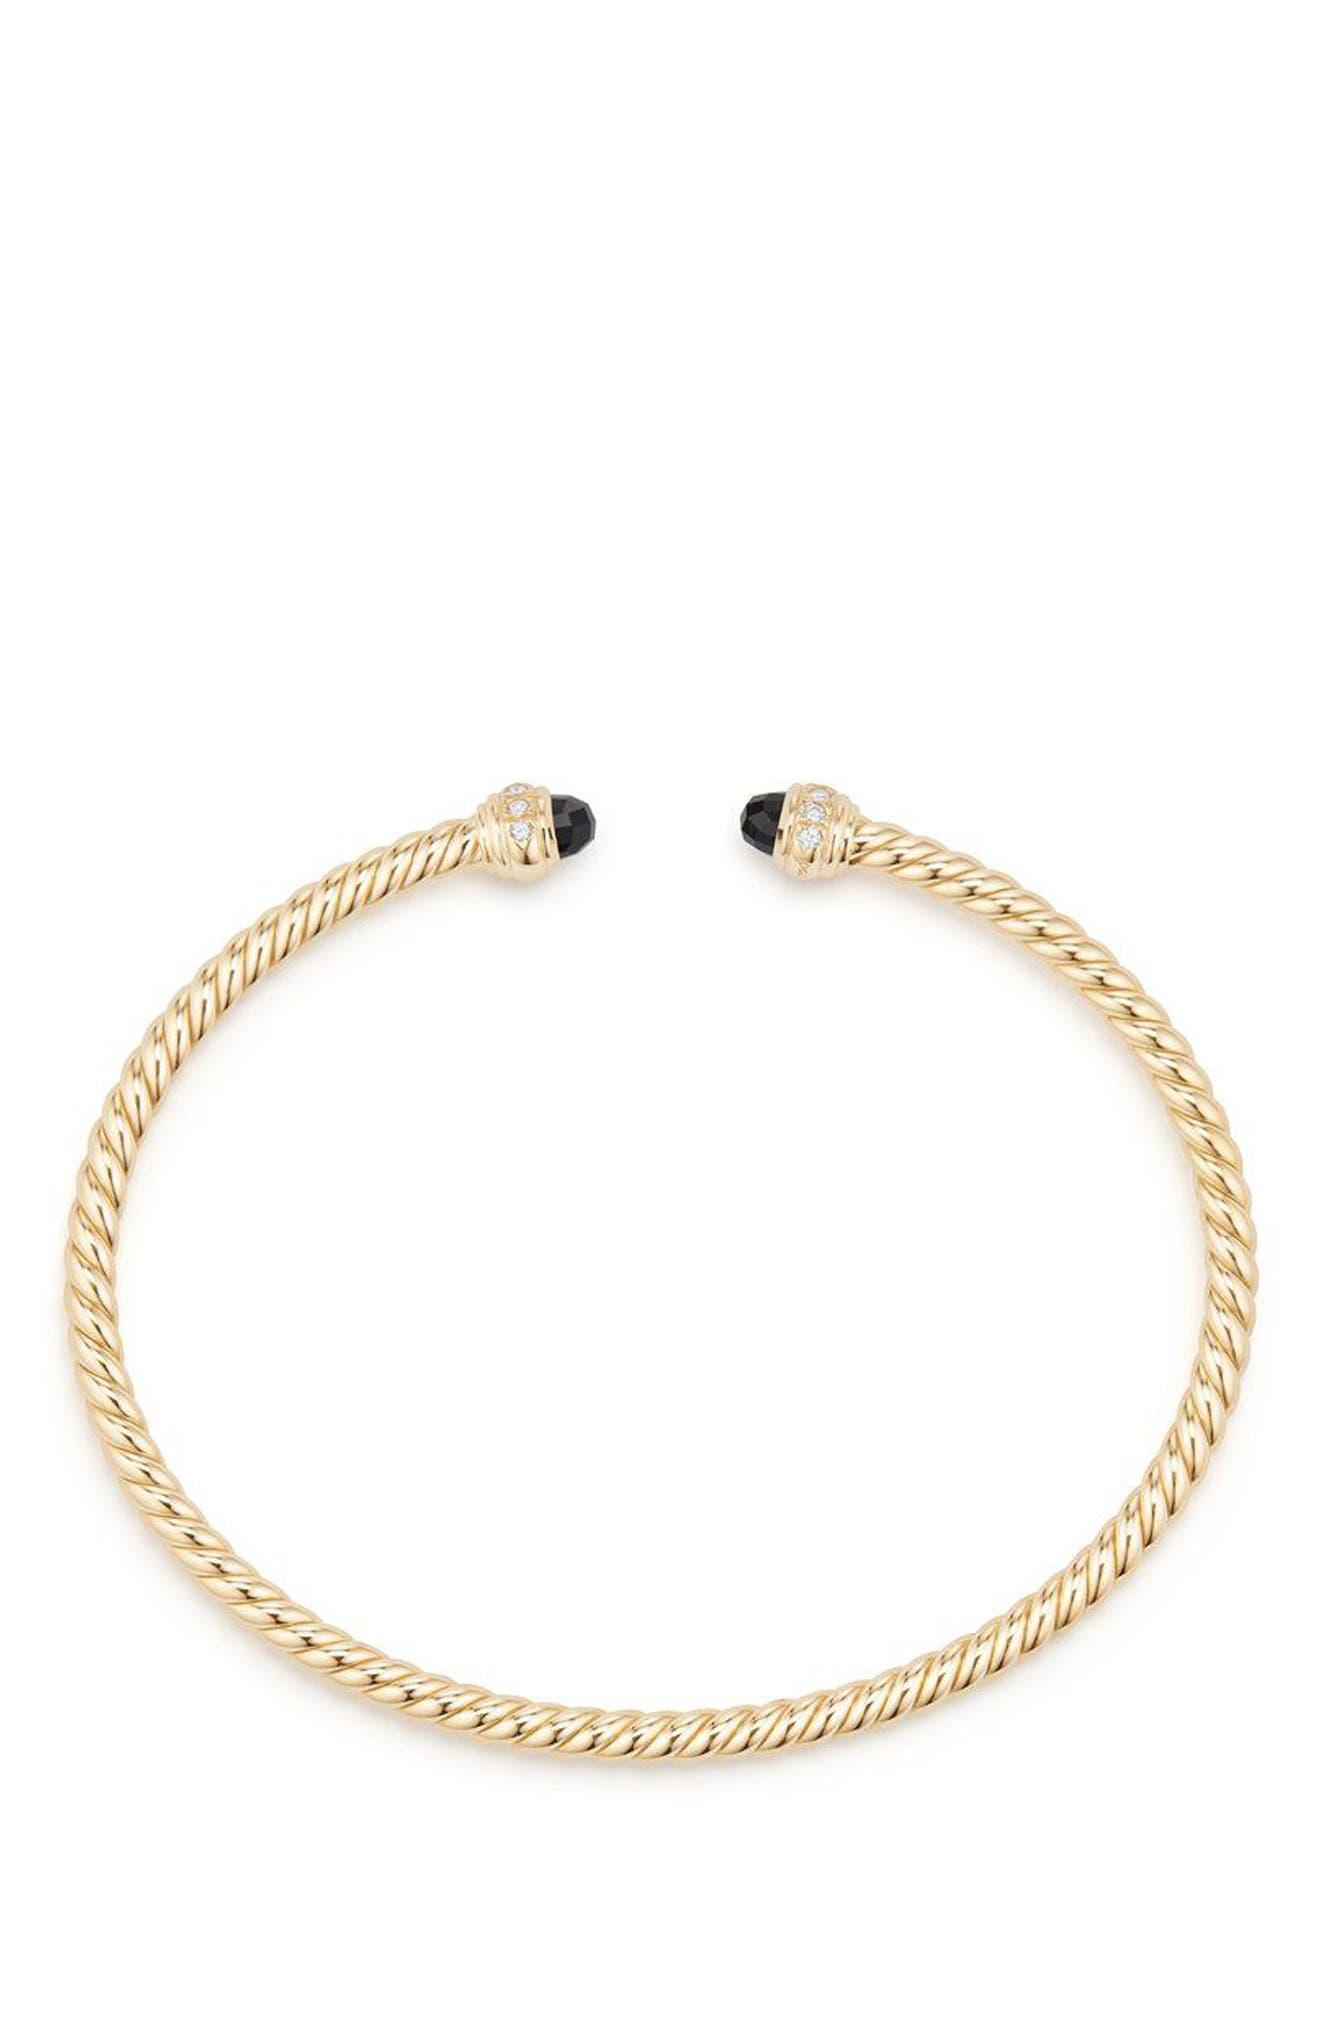 Alternate Image 2  - David Yurman Cable Spira Bracelet in 18K Gold with Diamonds, 3mm